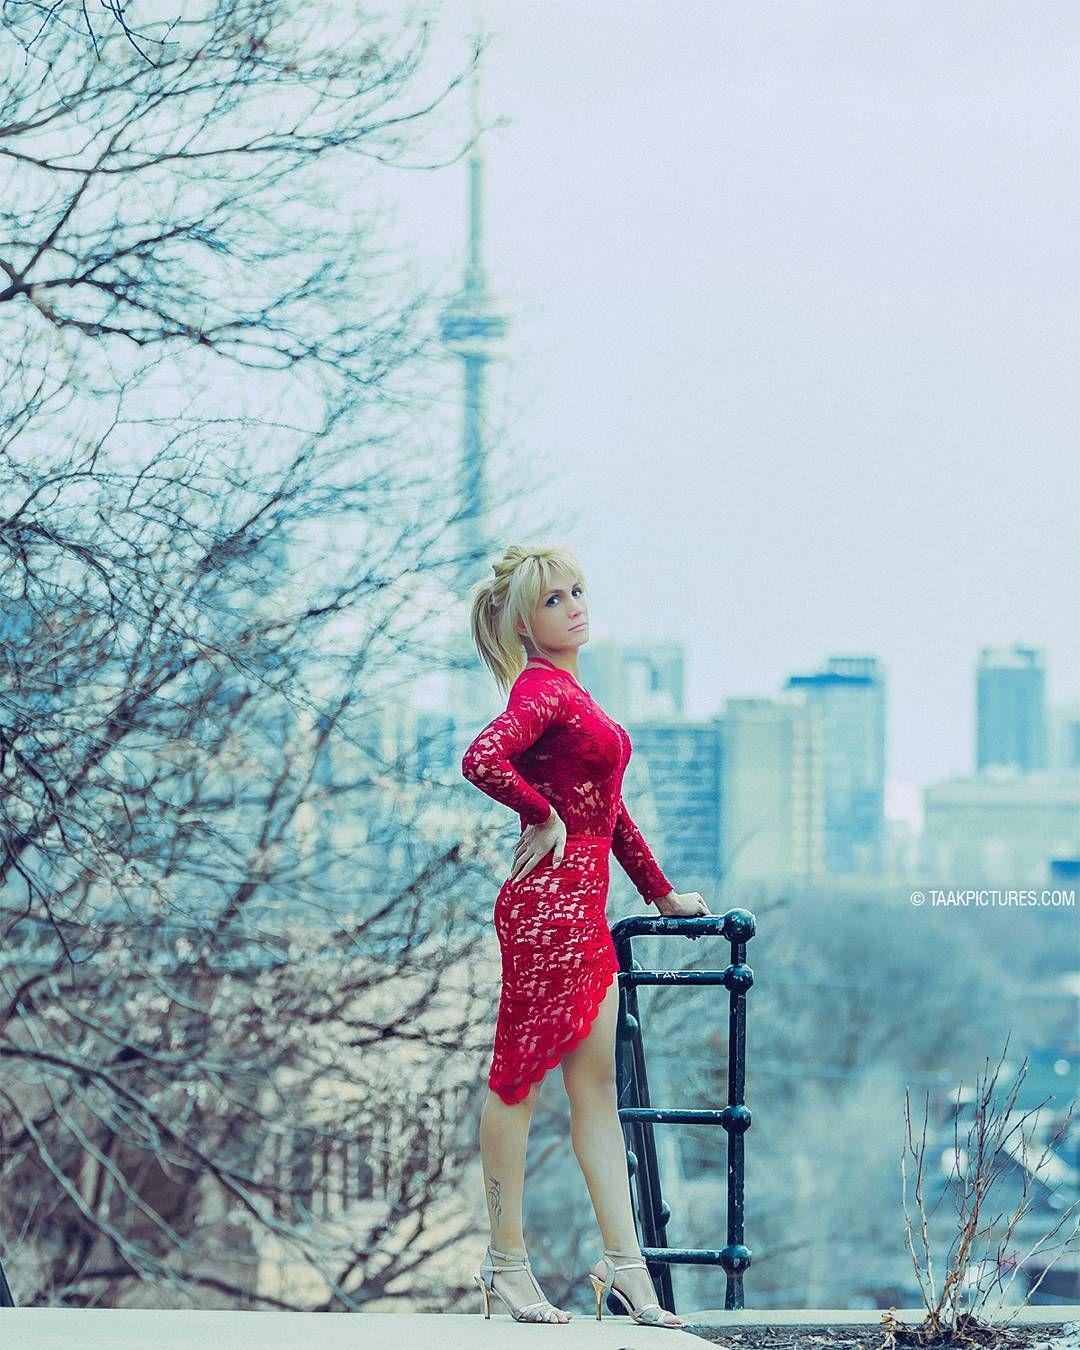 Winter Fashion Model Photography: Taak Fashion/Glamour Modeling Photography